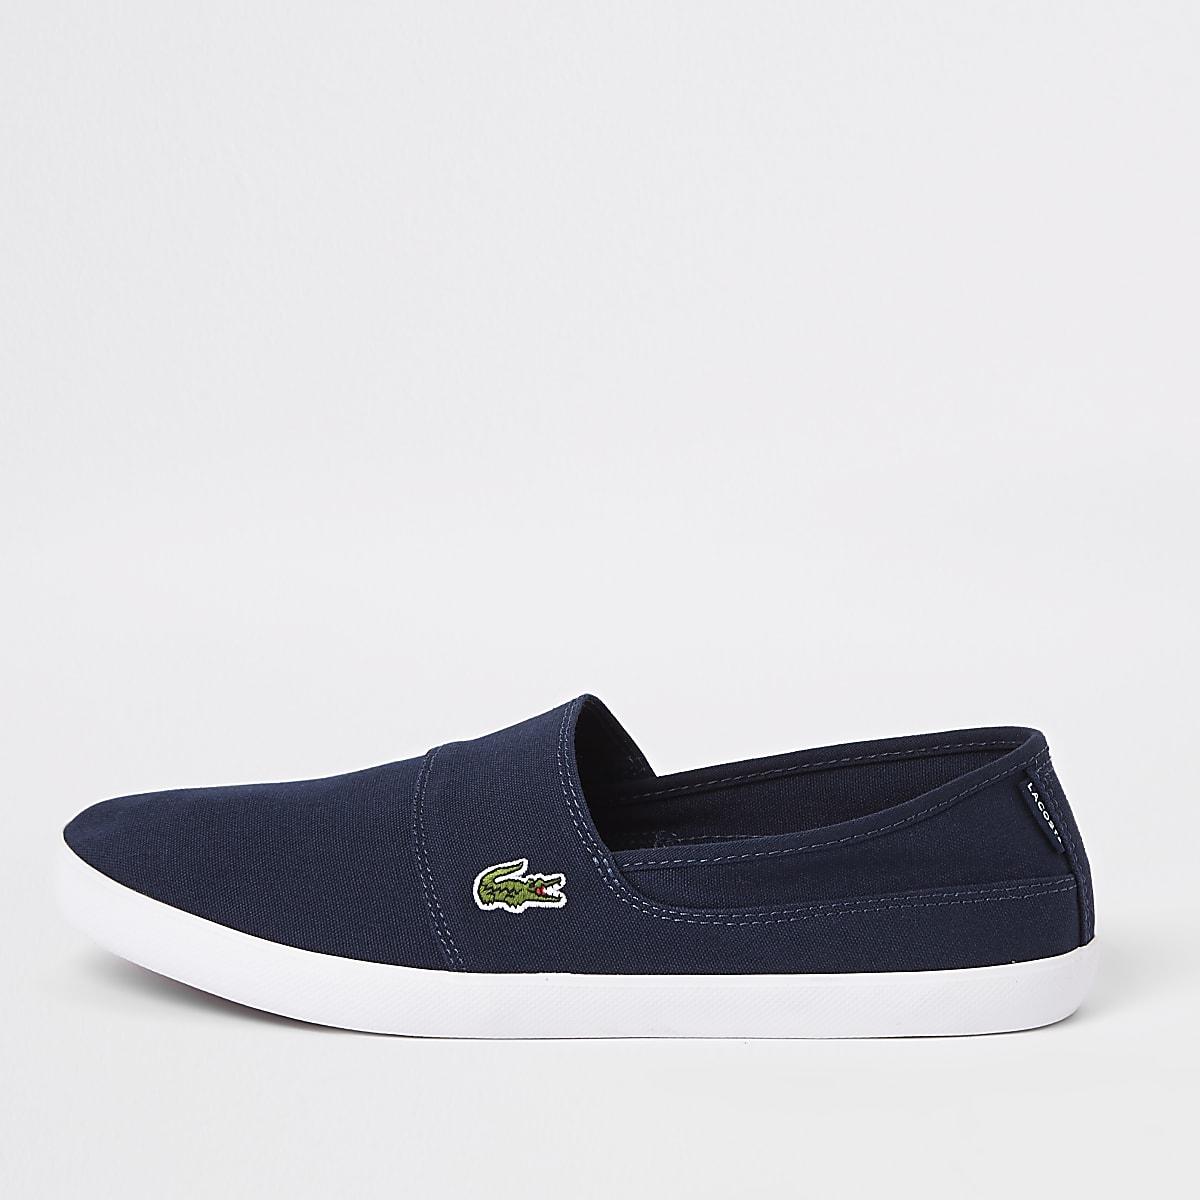 Lacoste instapsneakers in marineblauw